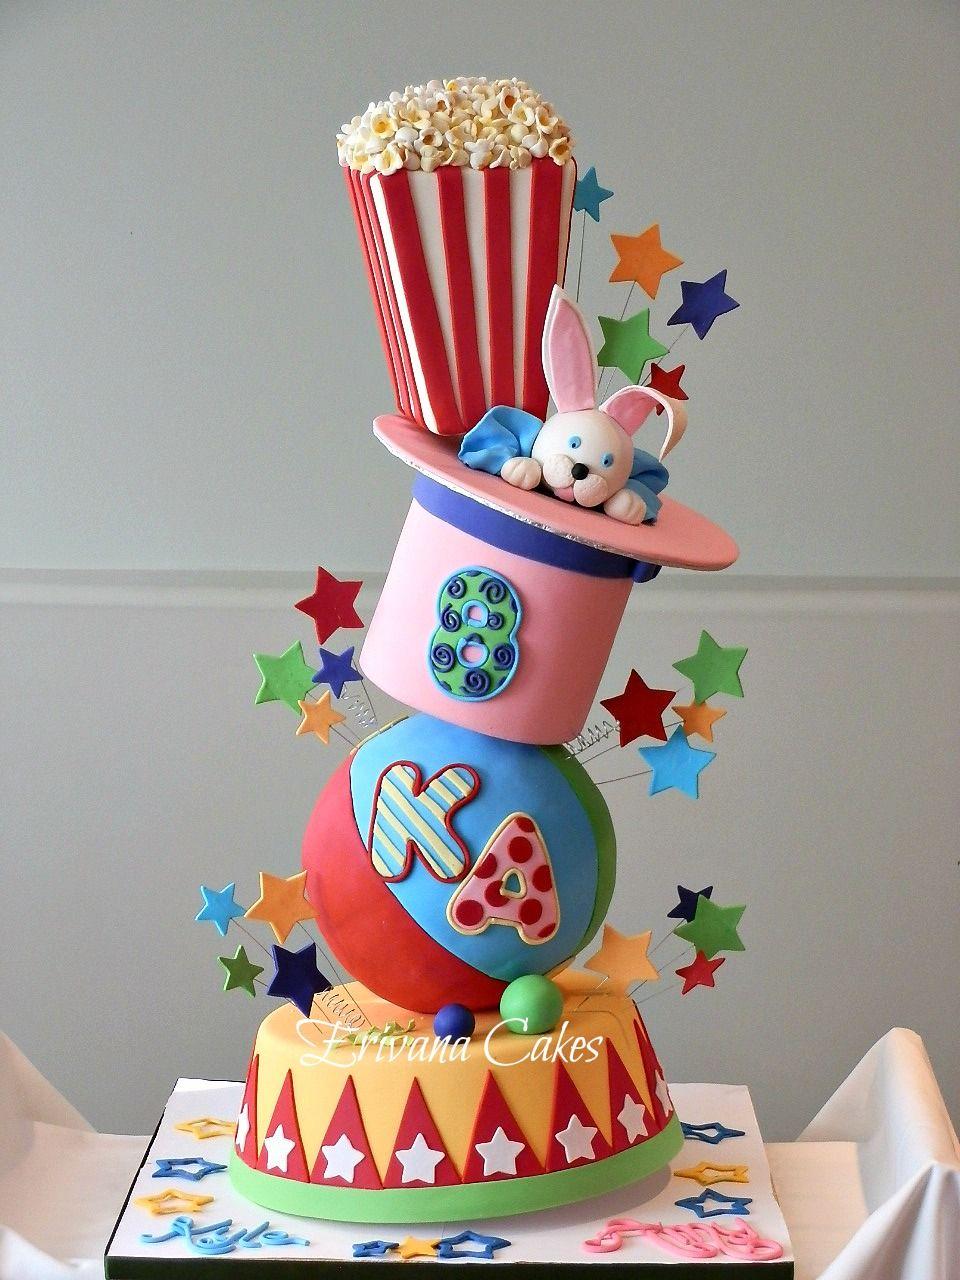 Topsy Turvy Carnival cake cakes for boys Pinterest Carnival